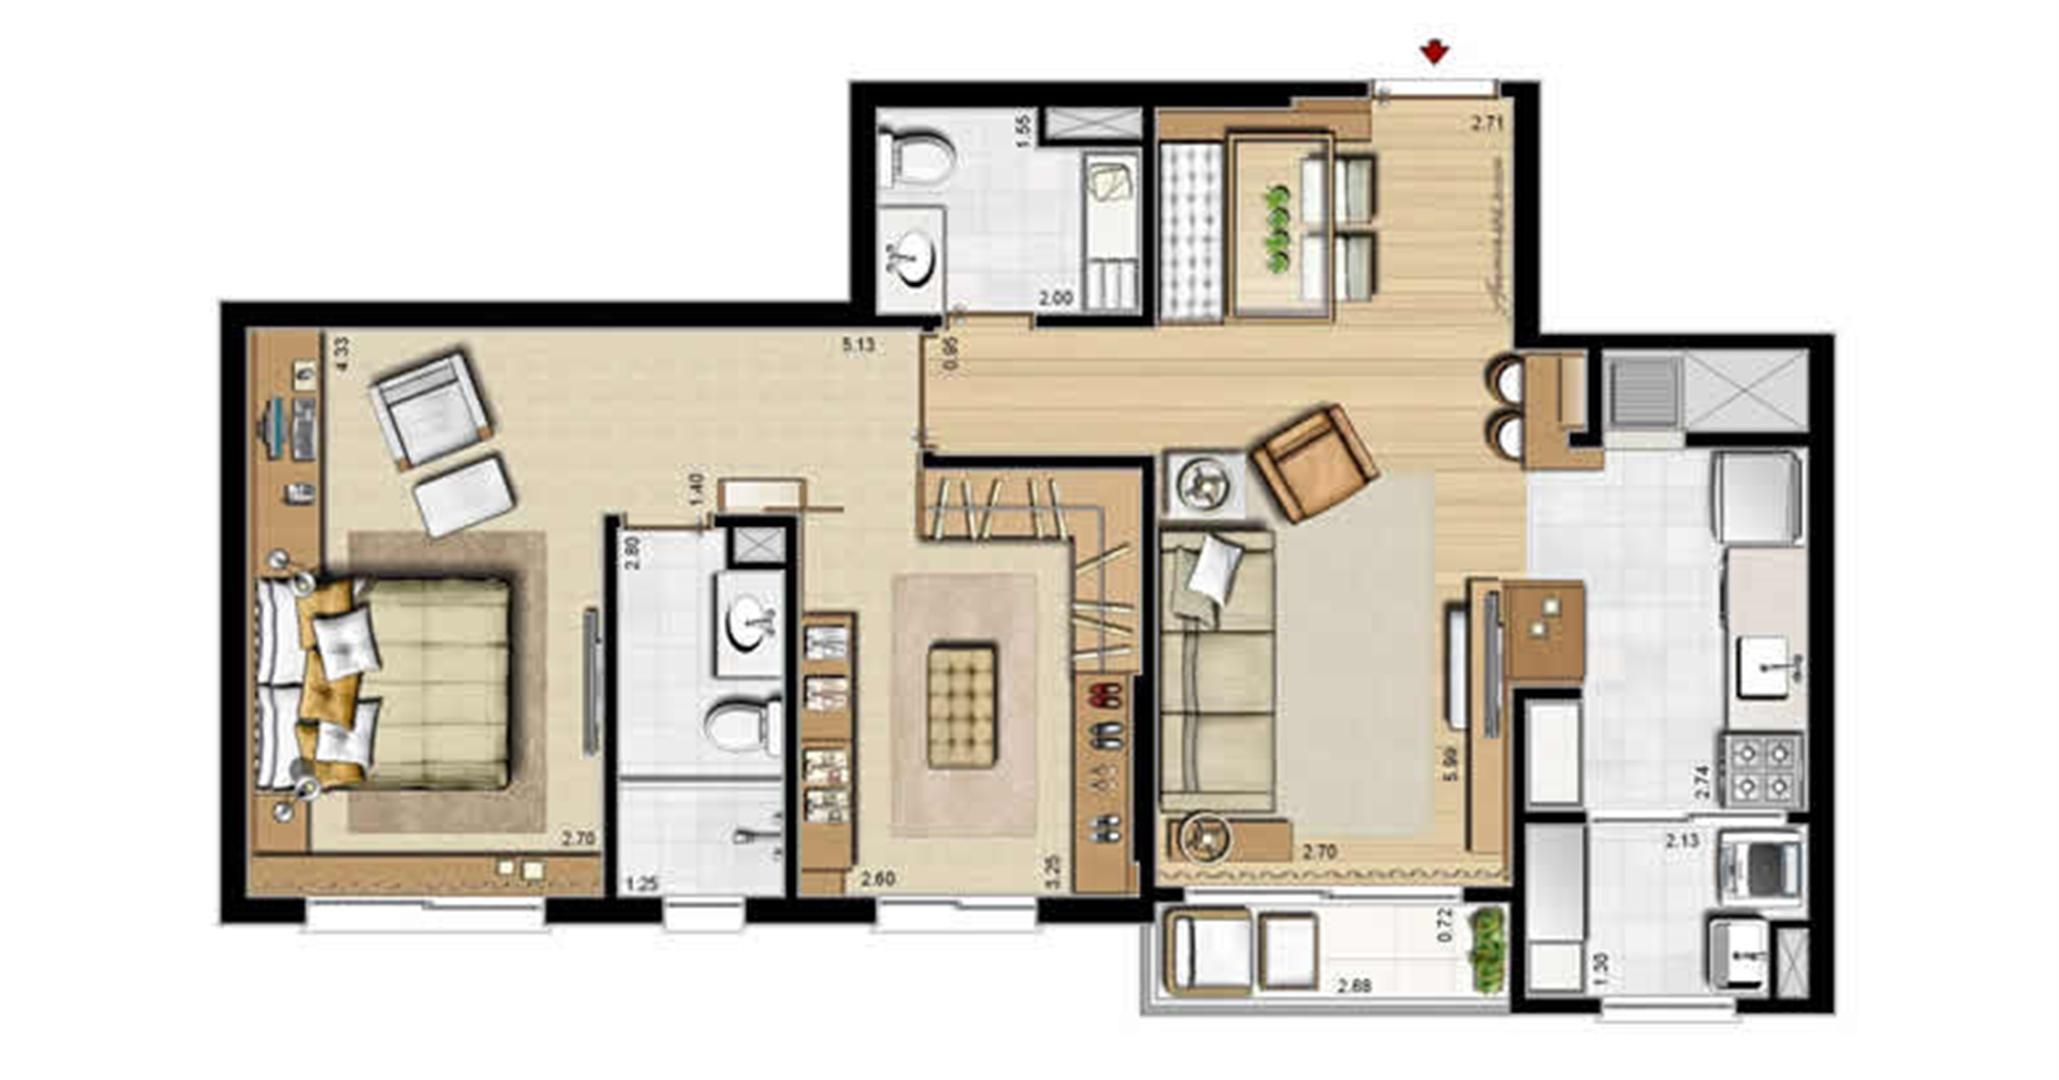 Opção suíte master e lavabo - 69 m² privativos e 107 m² área total | Villa Mimosa Vita Insolaratta – Apartamento no  Centro - Canoas - Rio Grande do Sul